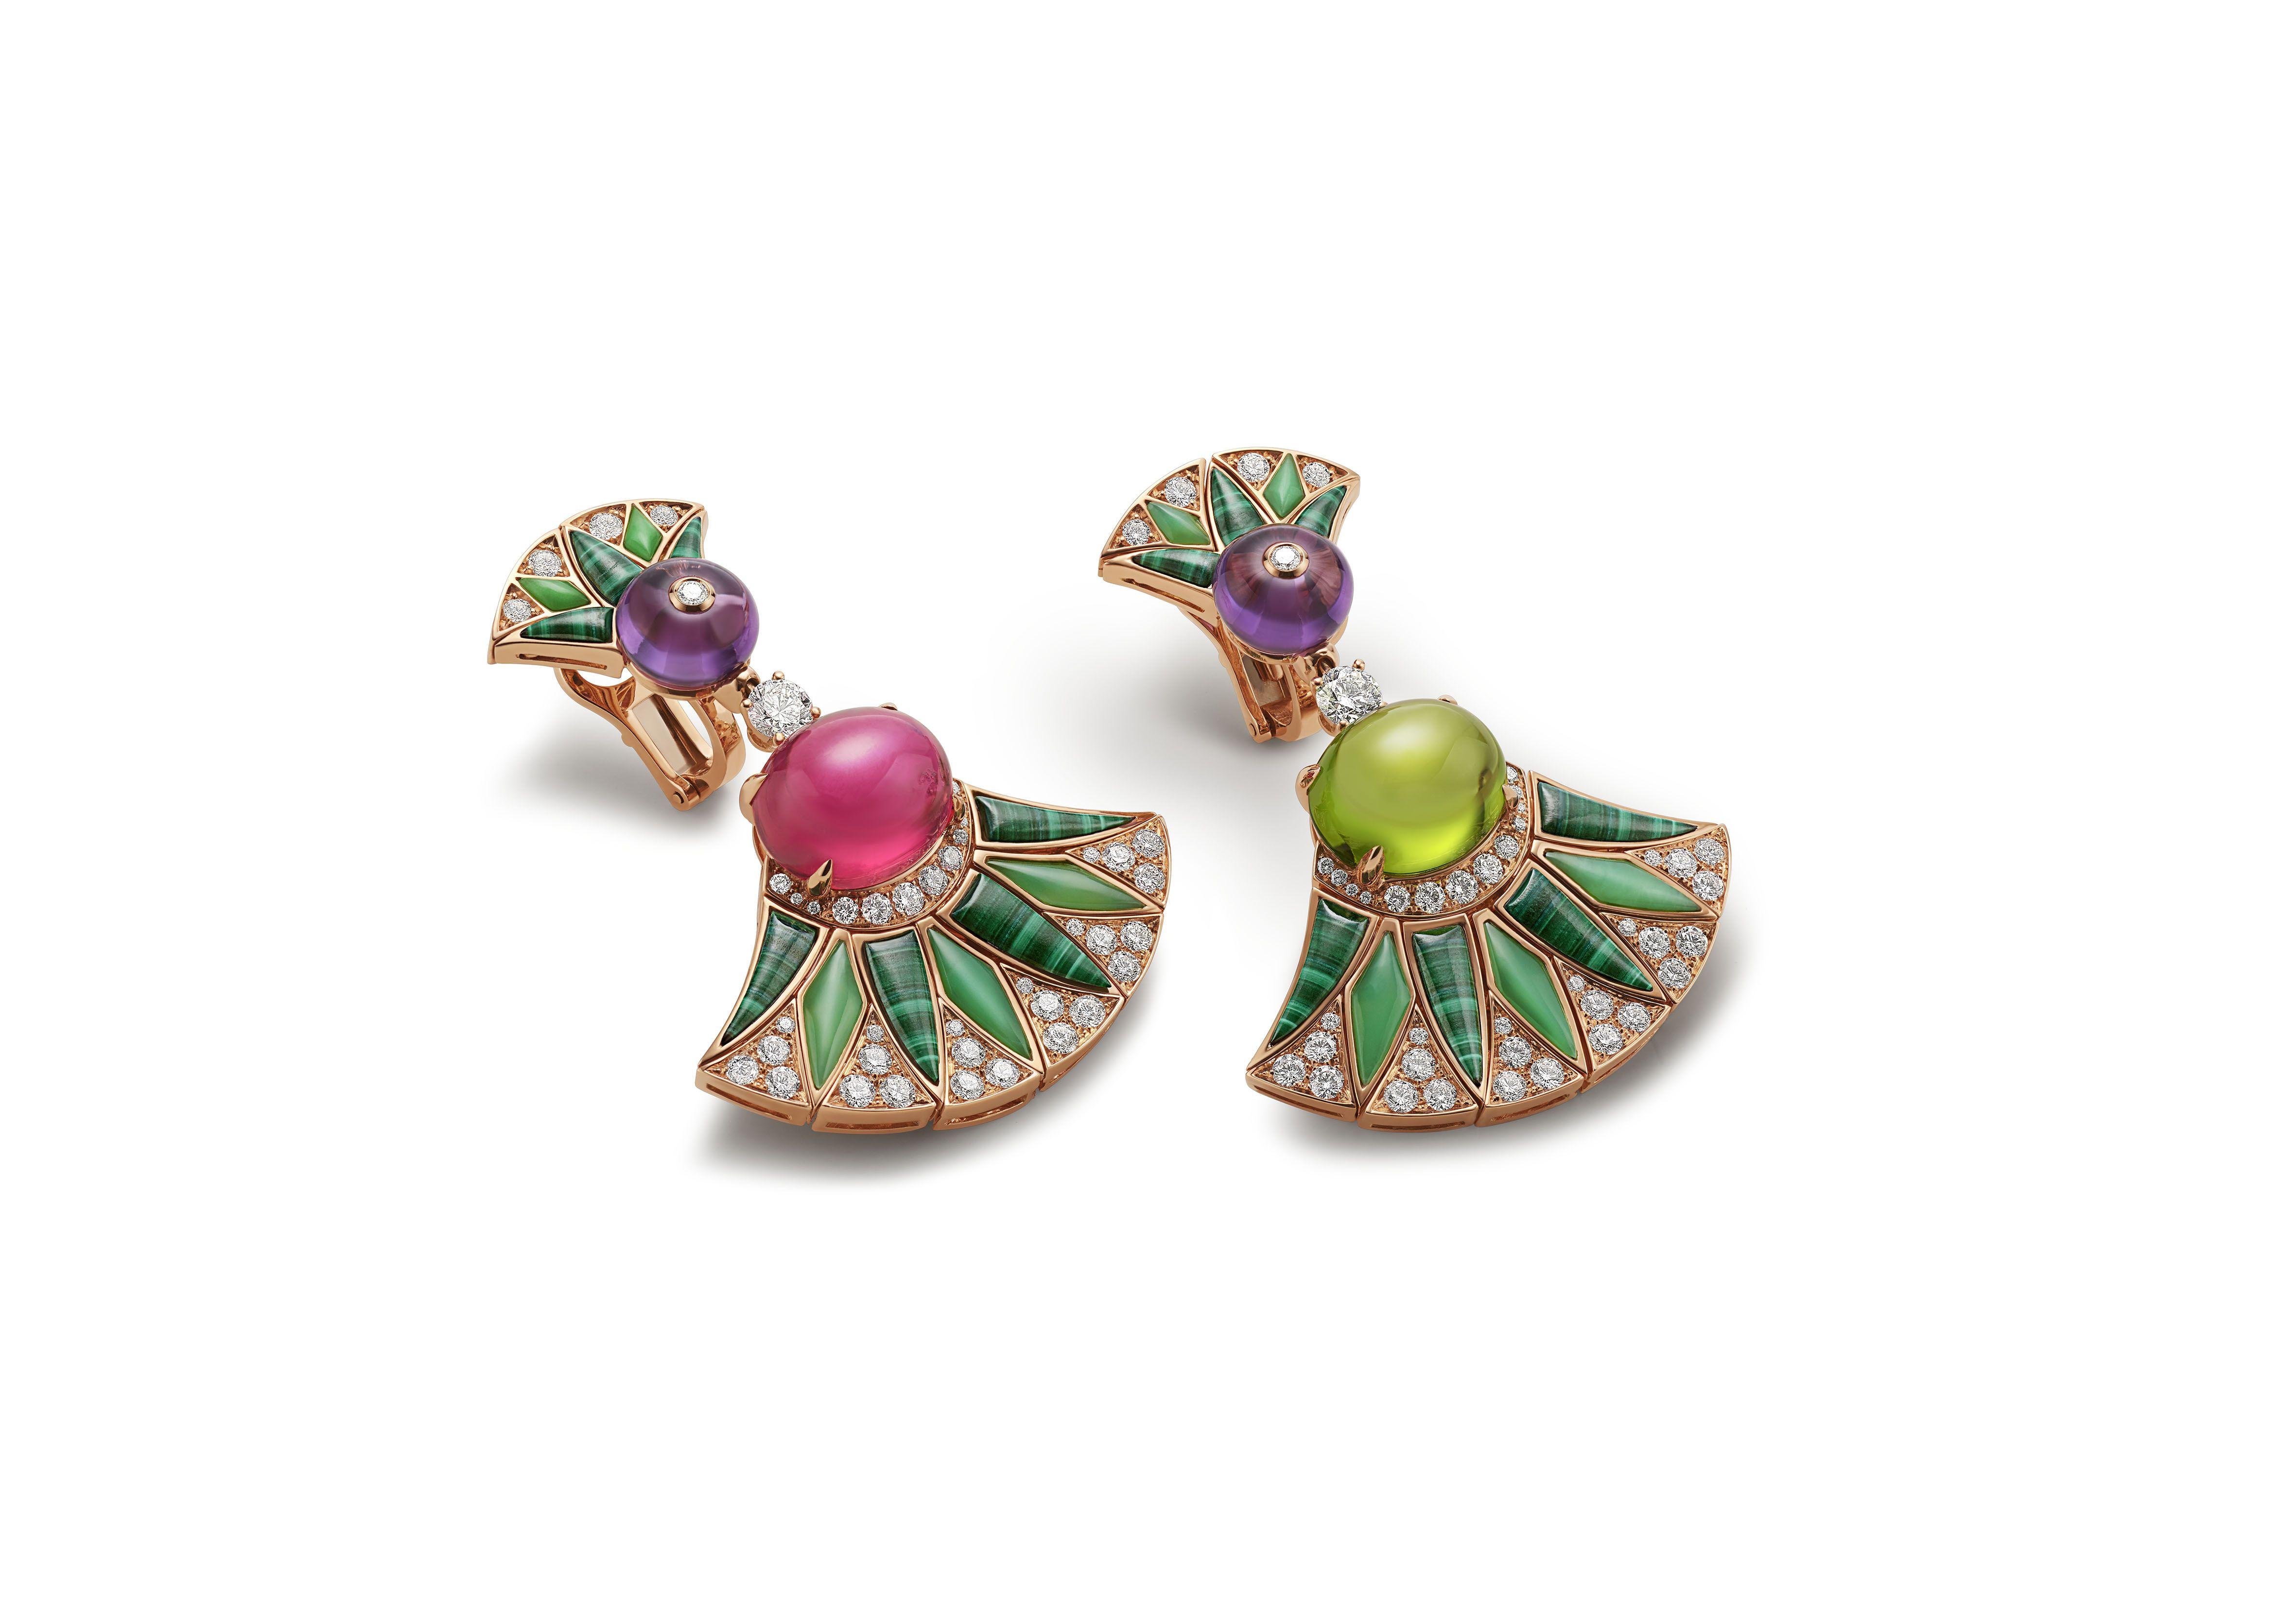 bulgari barocko earrings